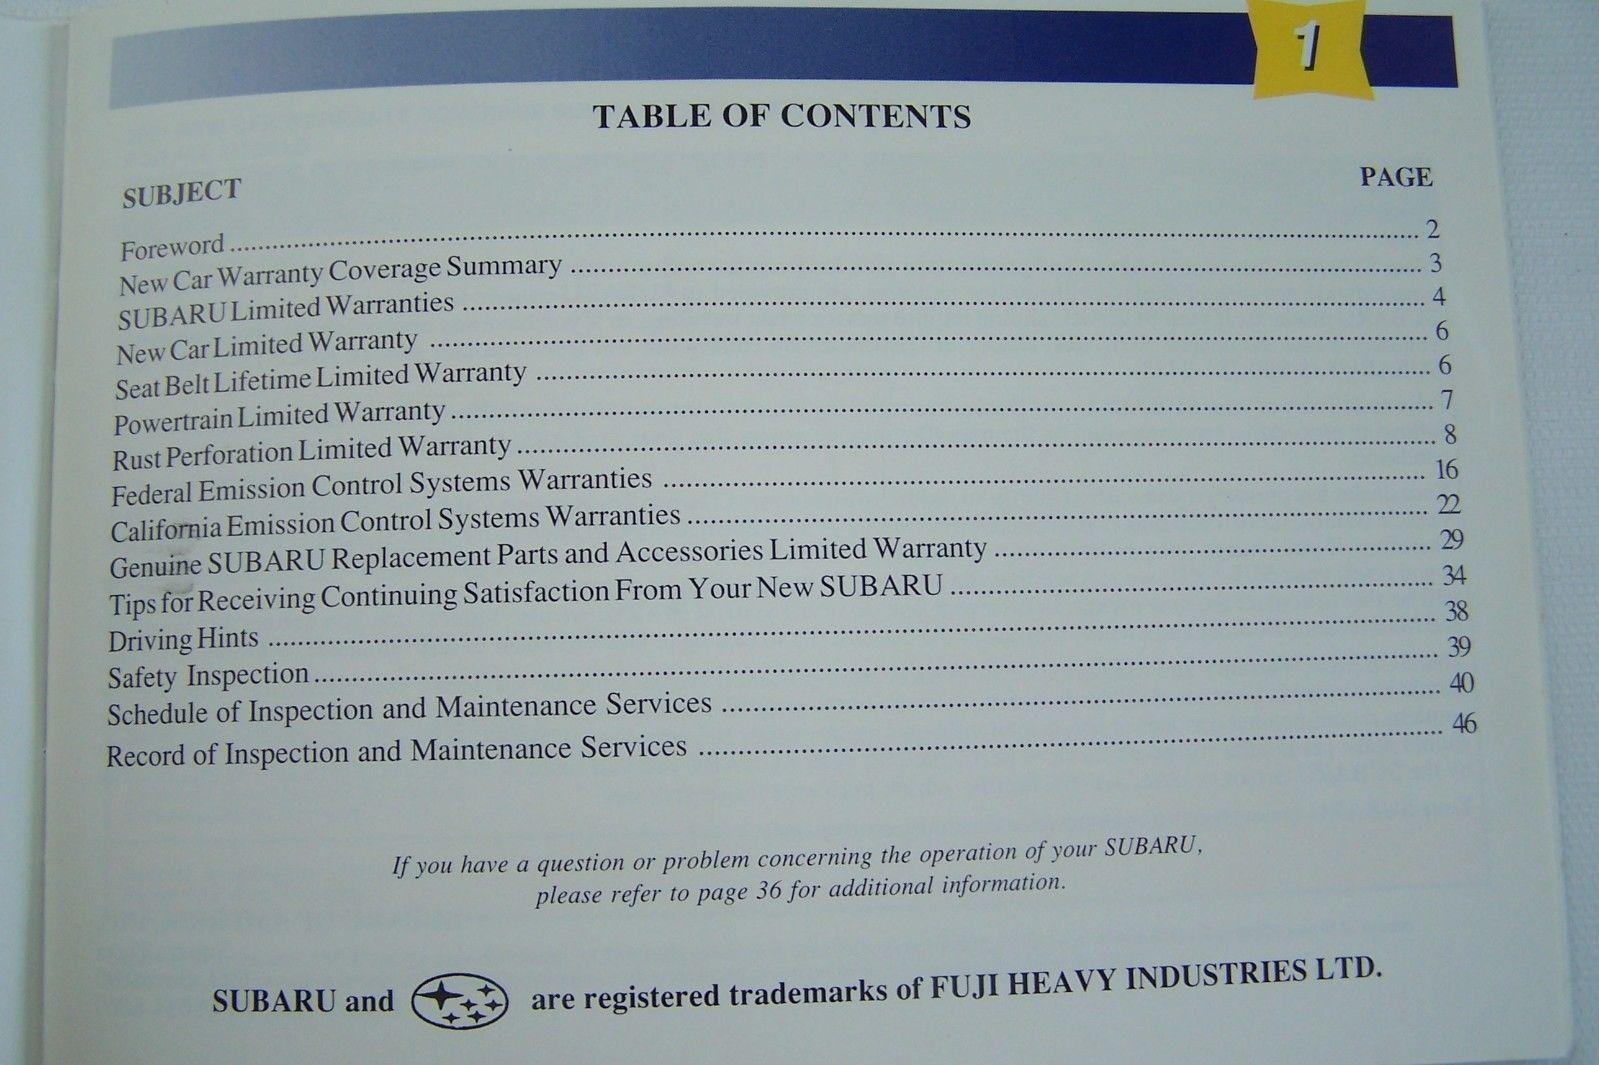 2003 subaru forester legacy impreza wrx owners maintenance schedule warranty